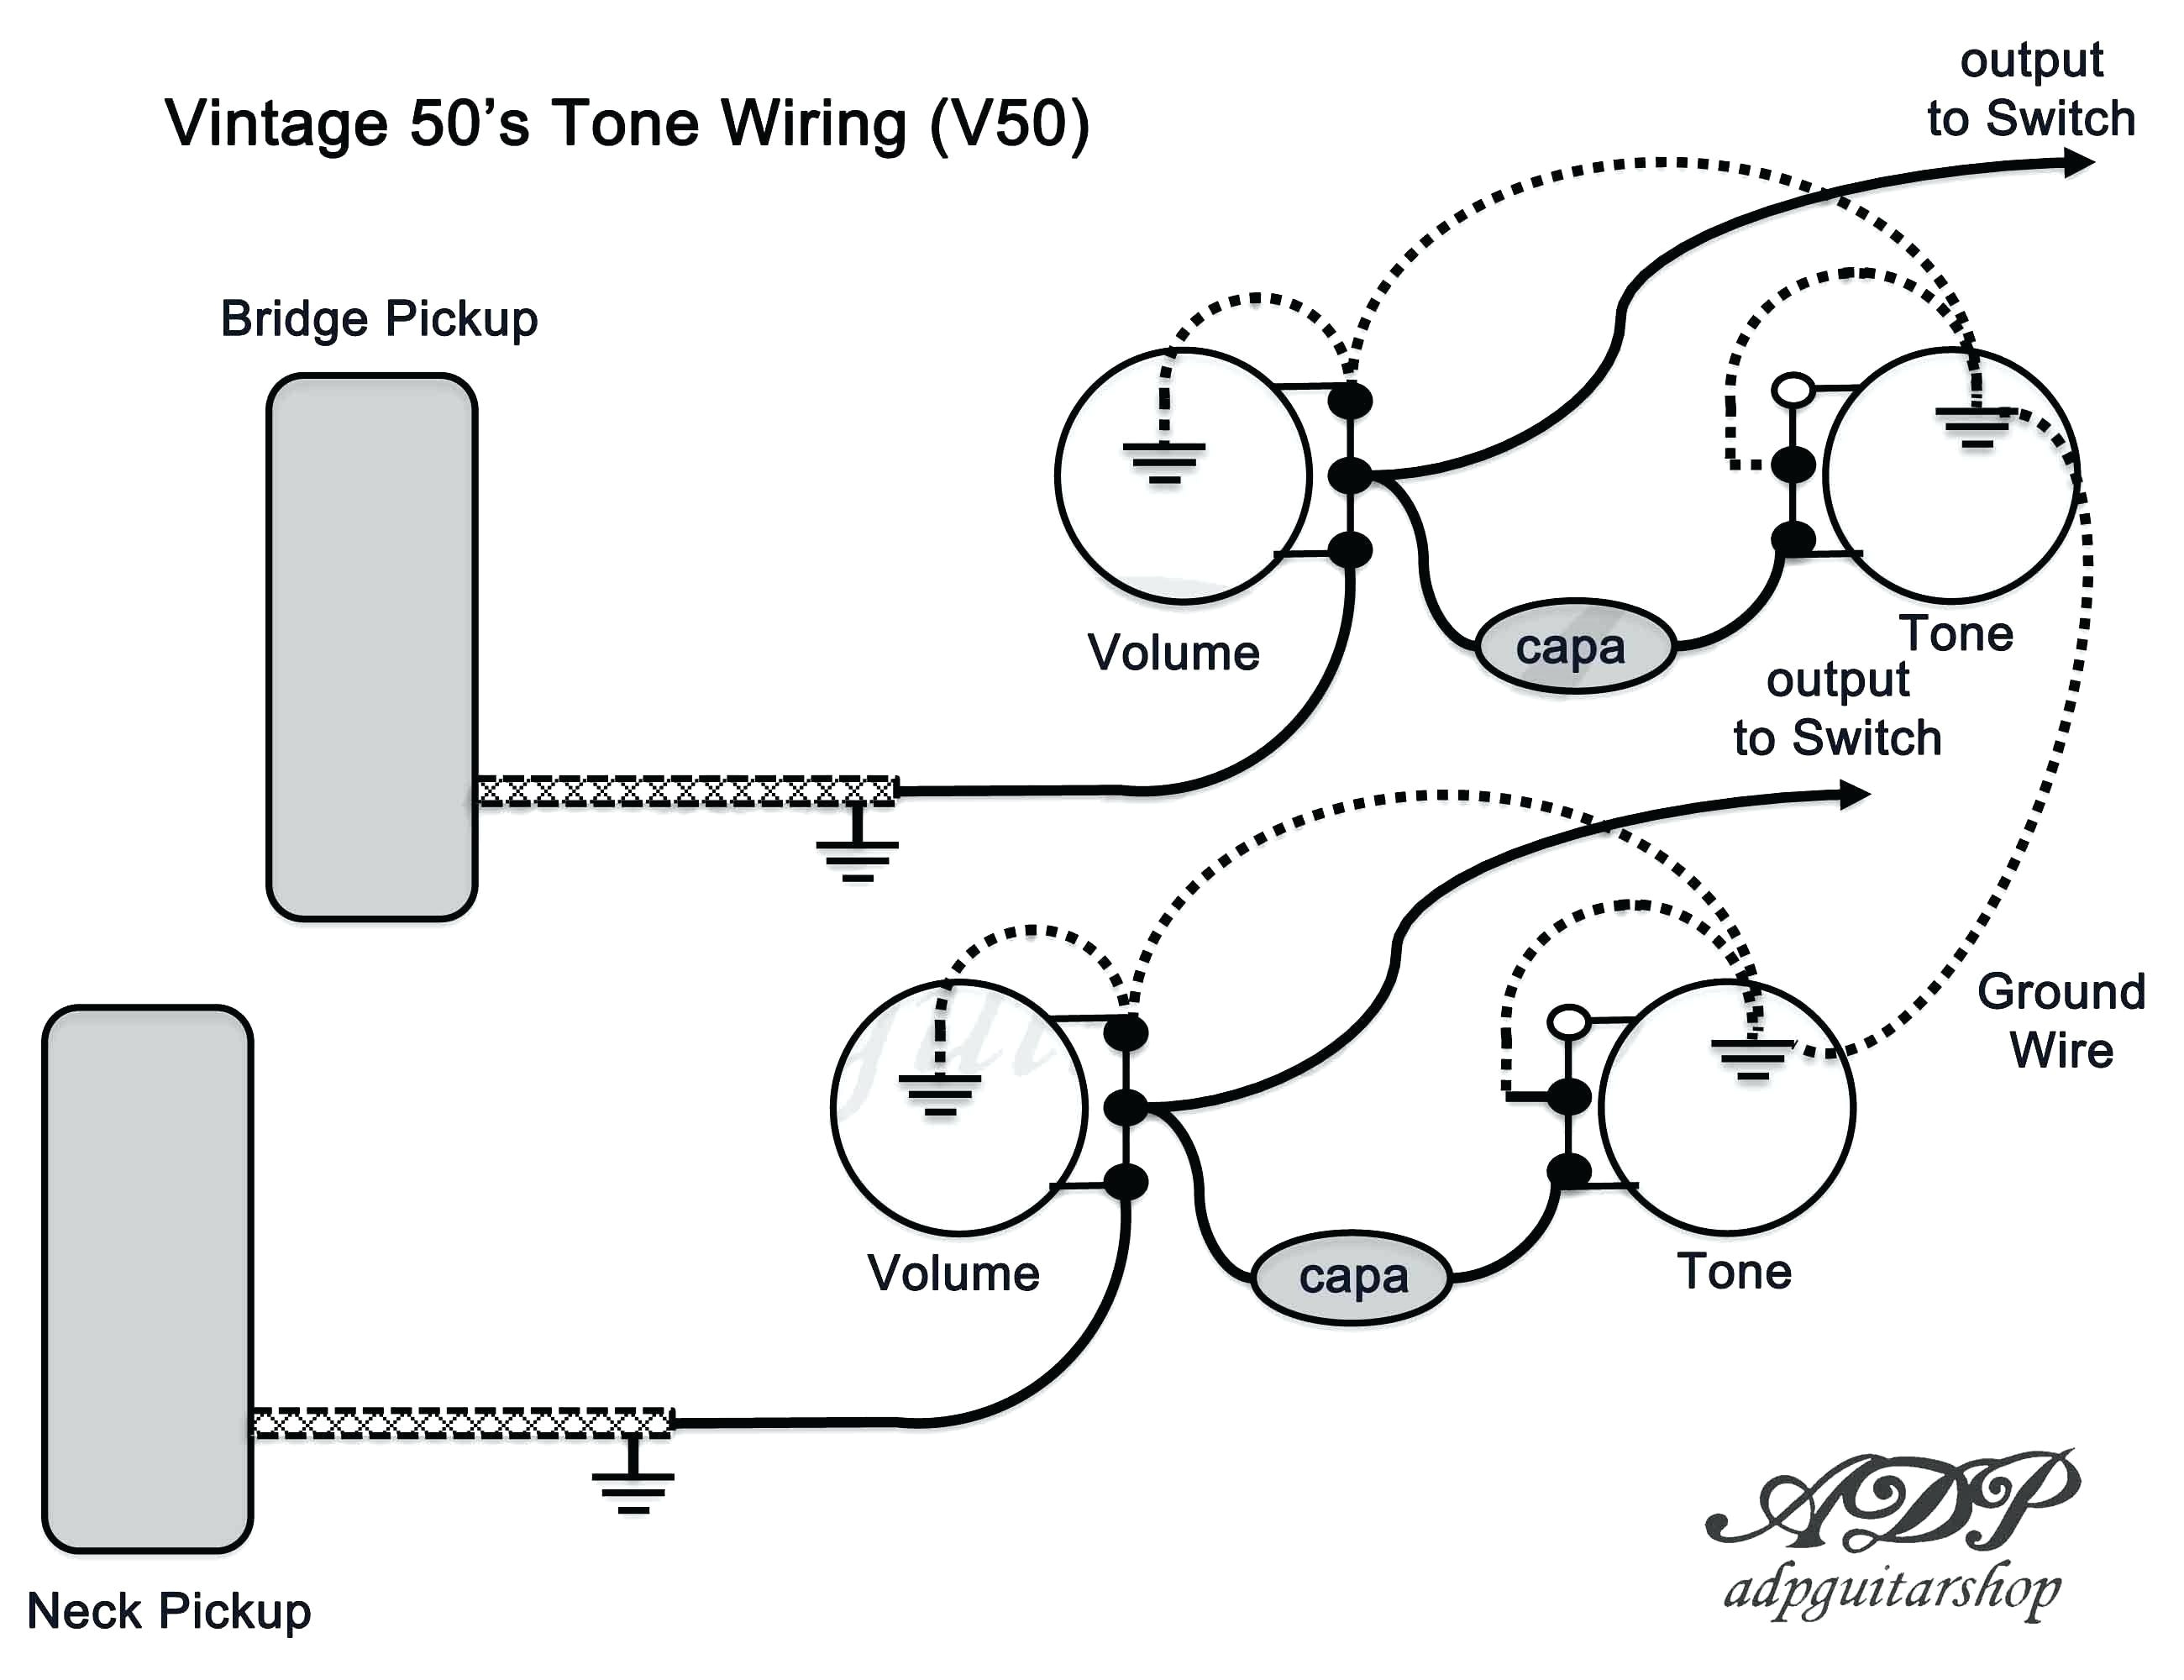 epiphone nighthawk wiring diagram wiring diagramgibson l6s wiring diagram wiring diagram technic mix gibson l6 s